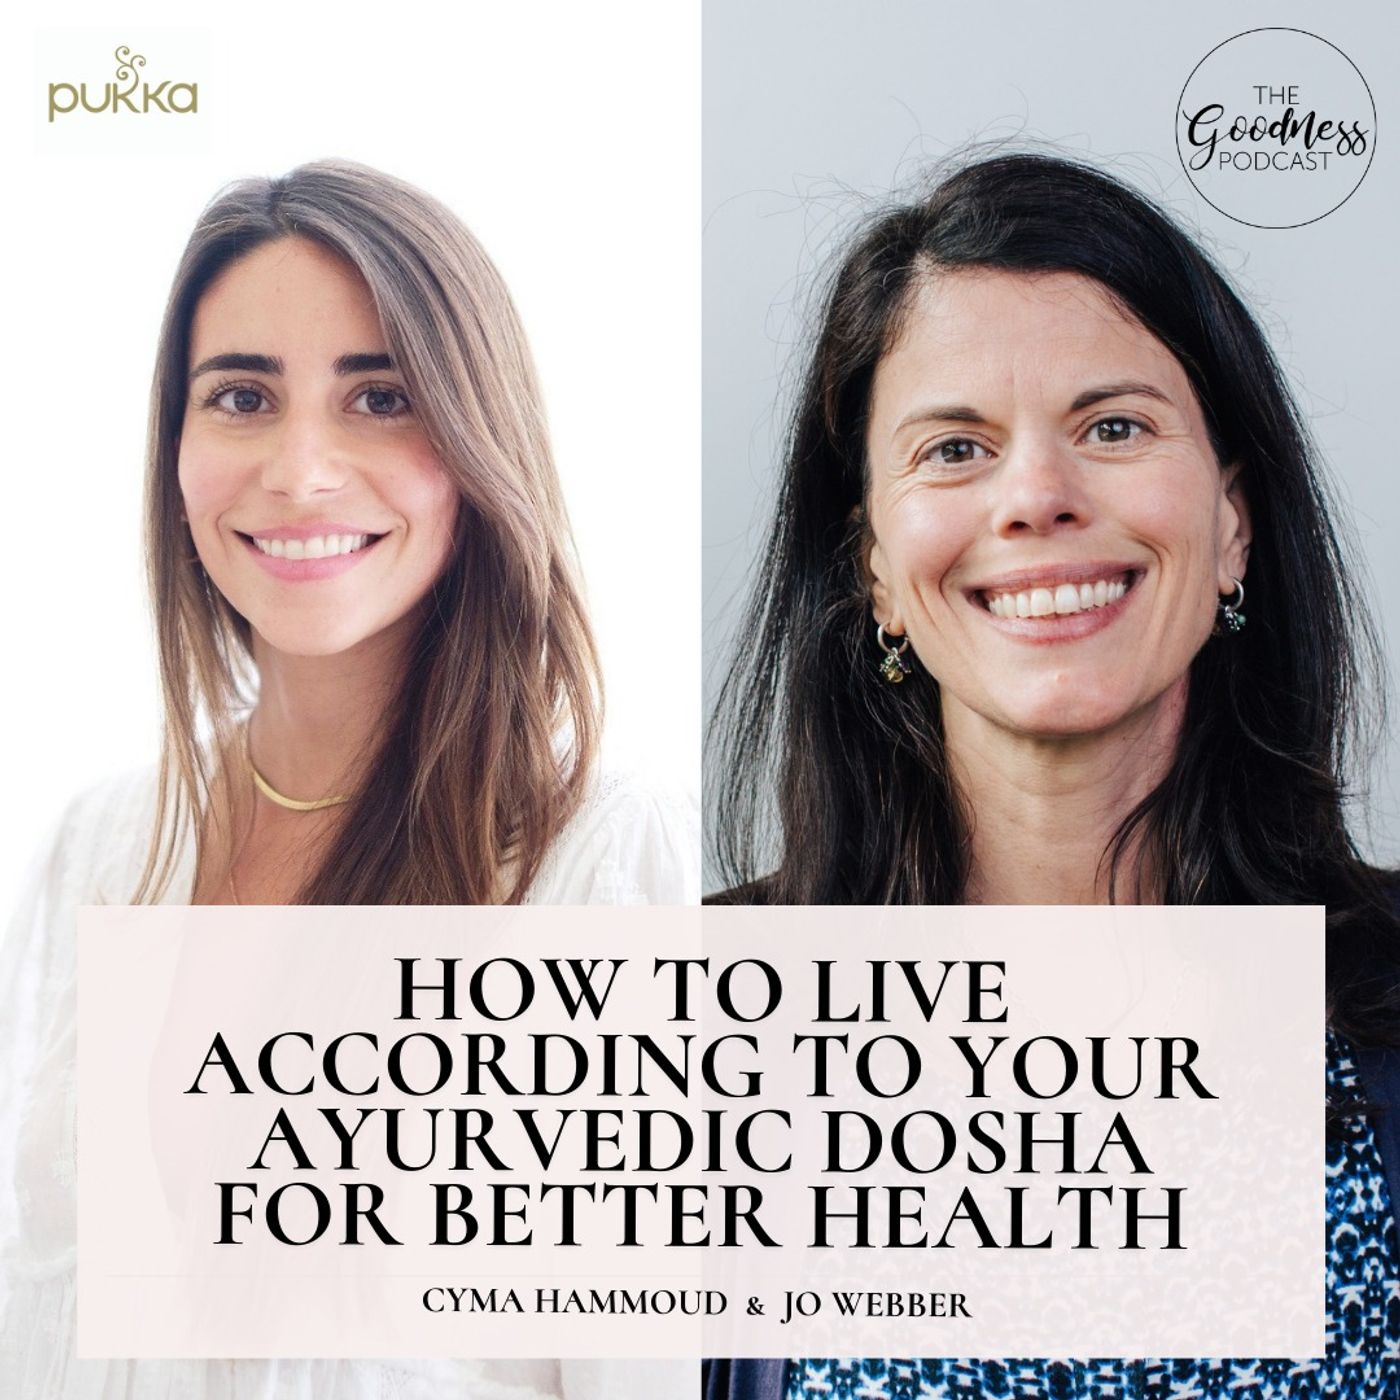 Cyma Hammoud & Jo Webber: How to Live According to Your Ayurvedic Dosha for Better Health